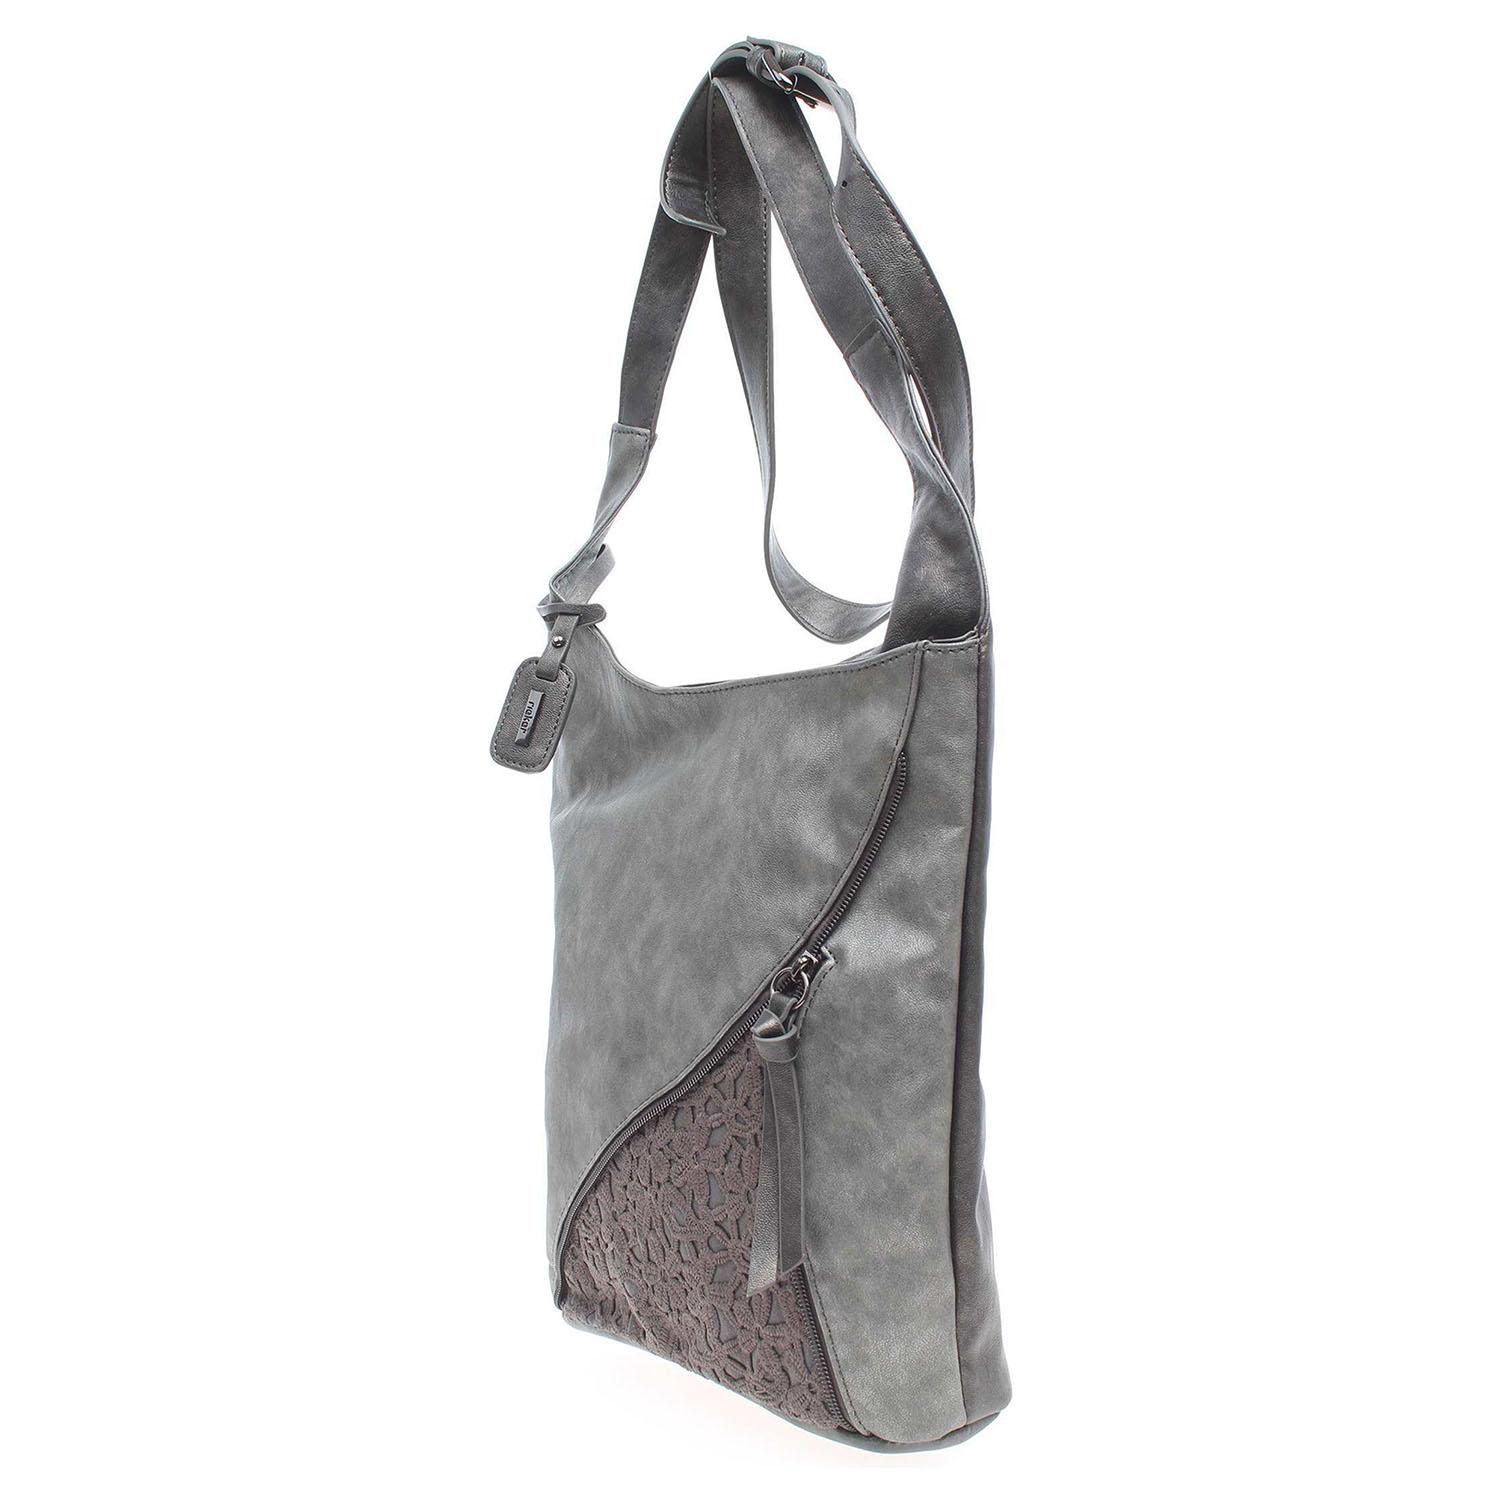 Ecco Rieker dámská kabelka H1428-45 šedá 11891123